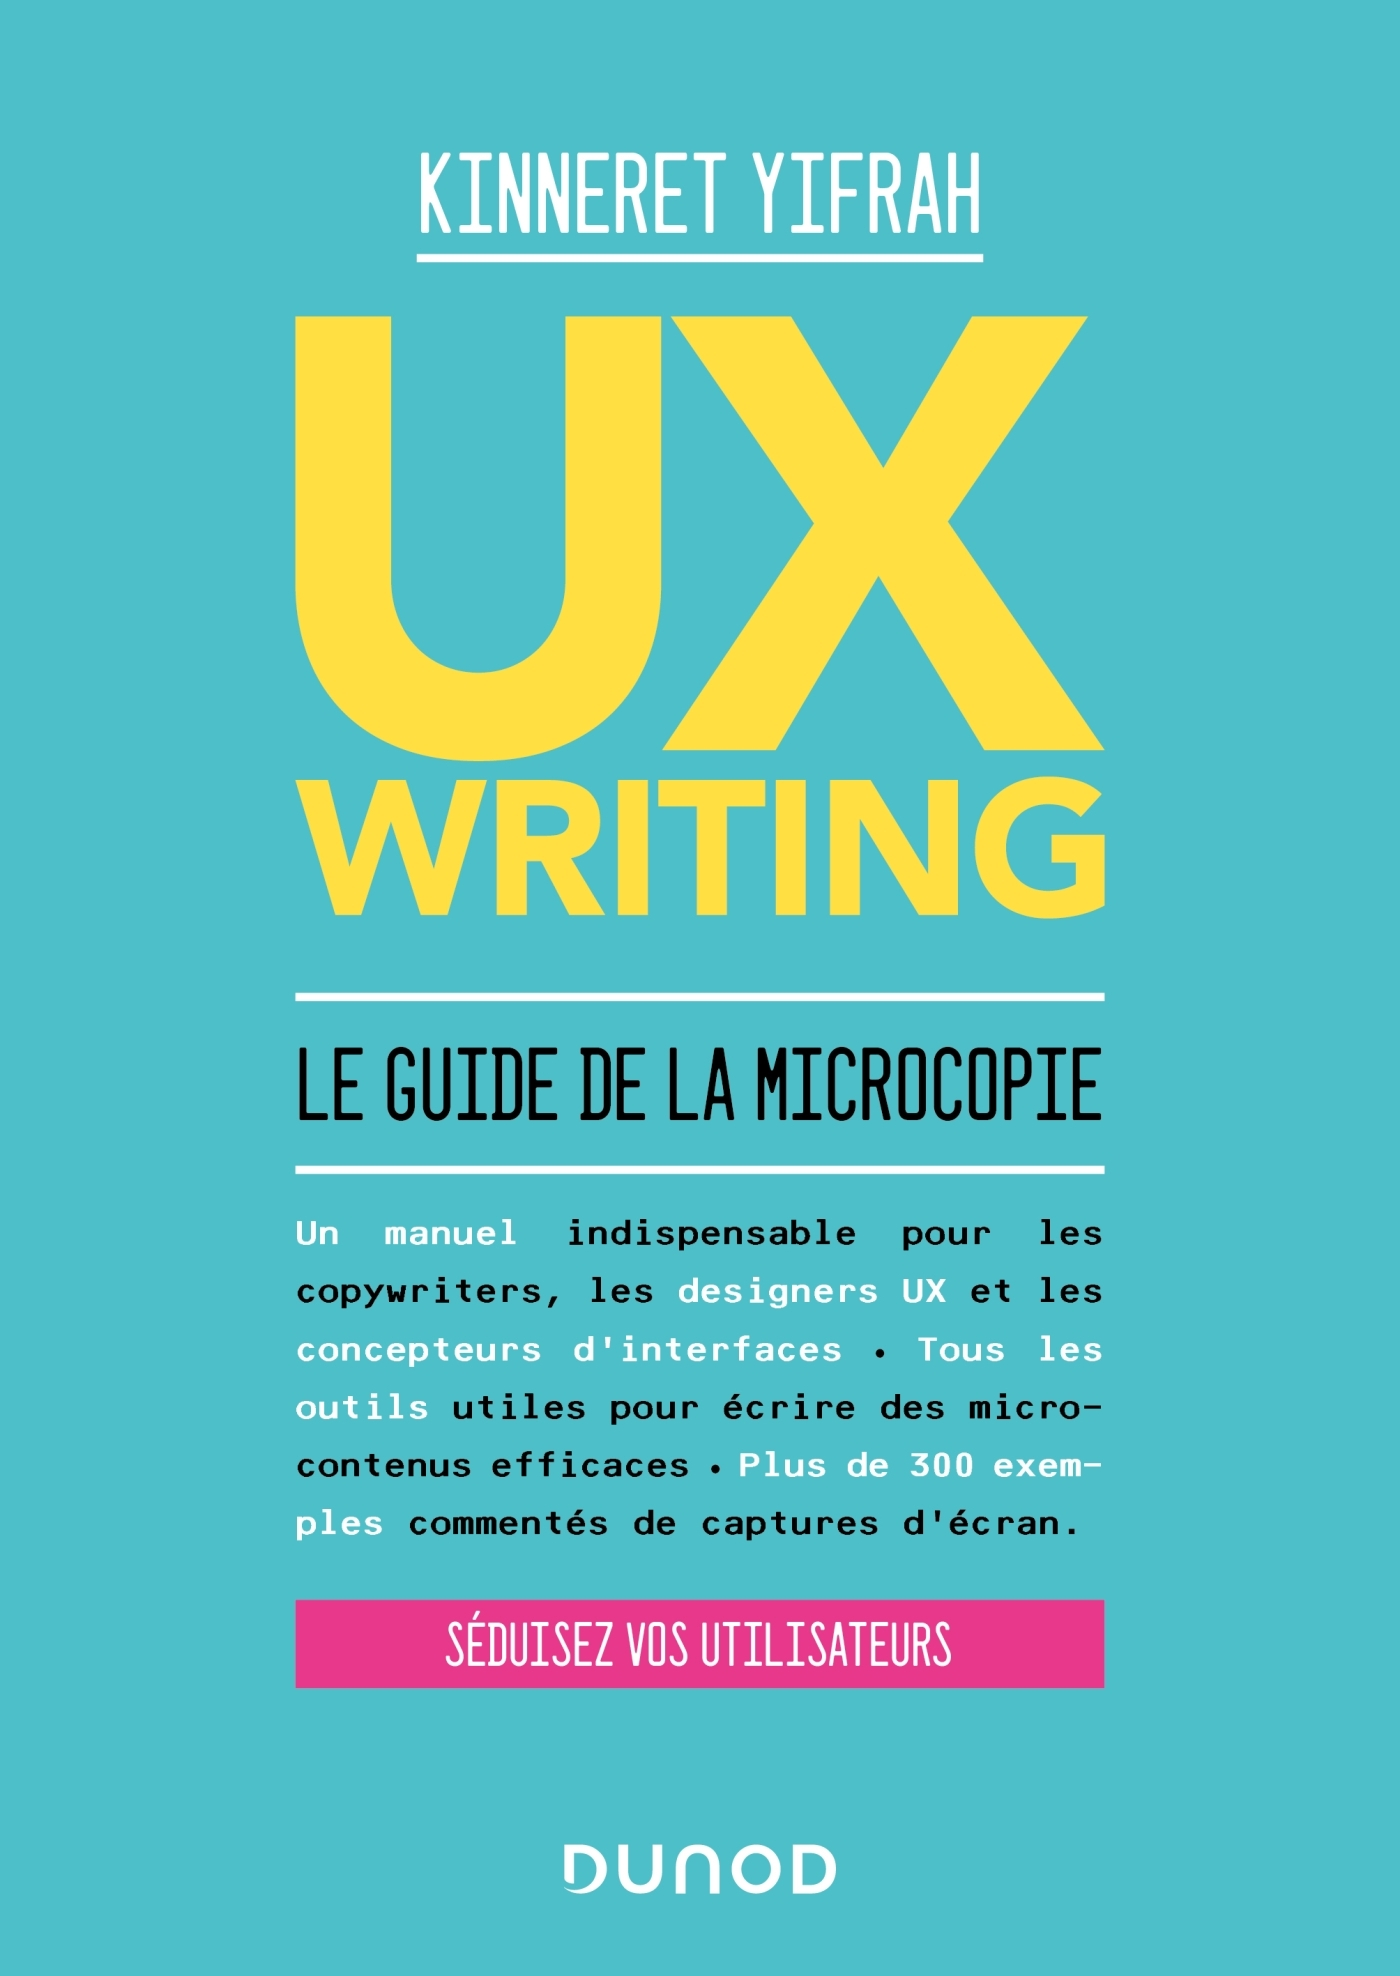 UX WRITING - LE GUIDE DE LA MICROCOPIE